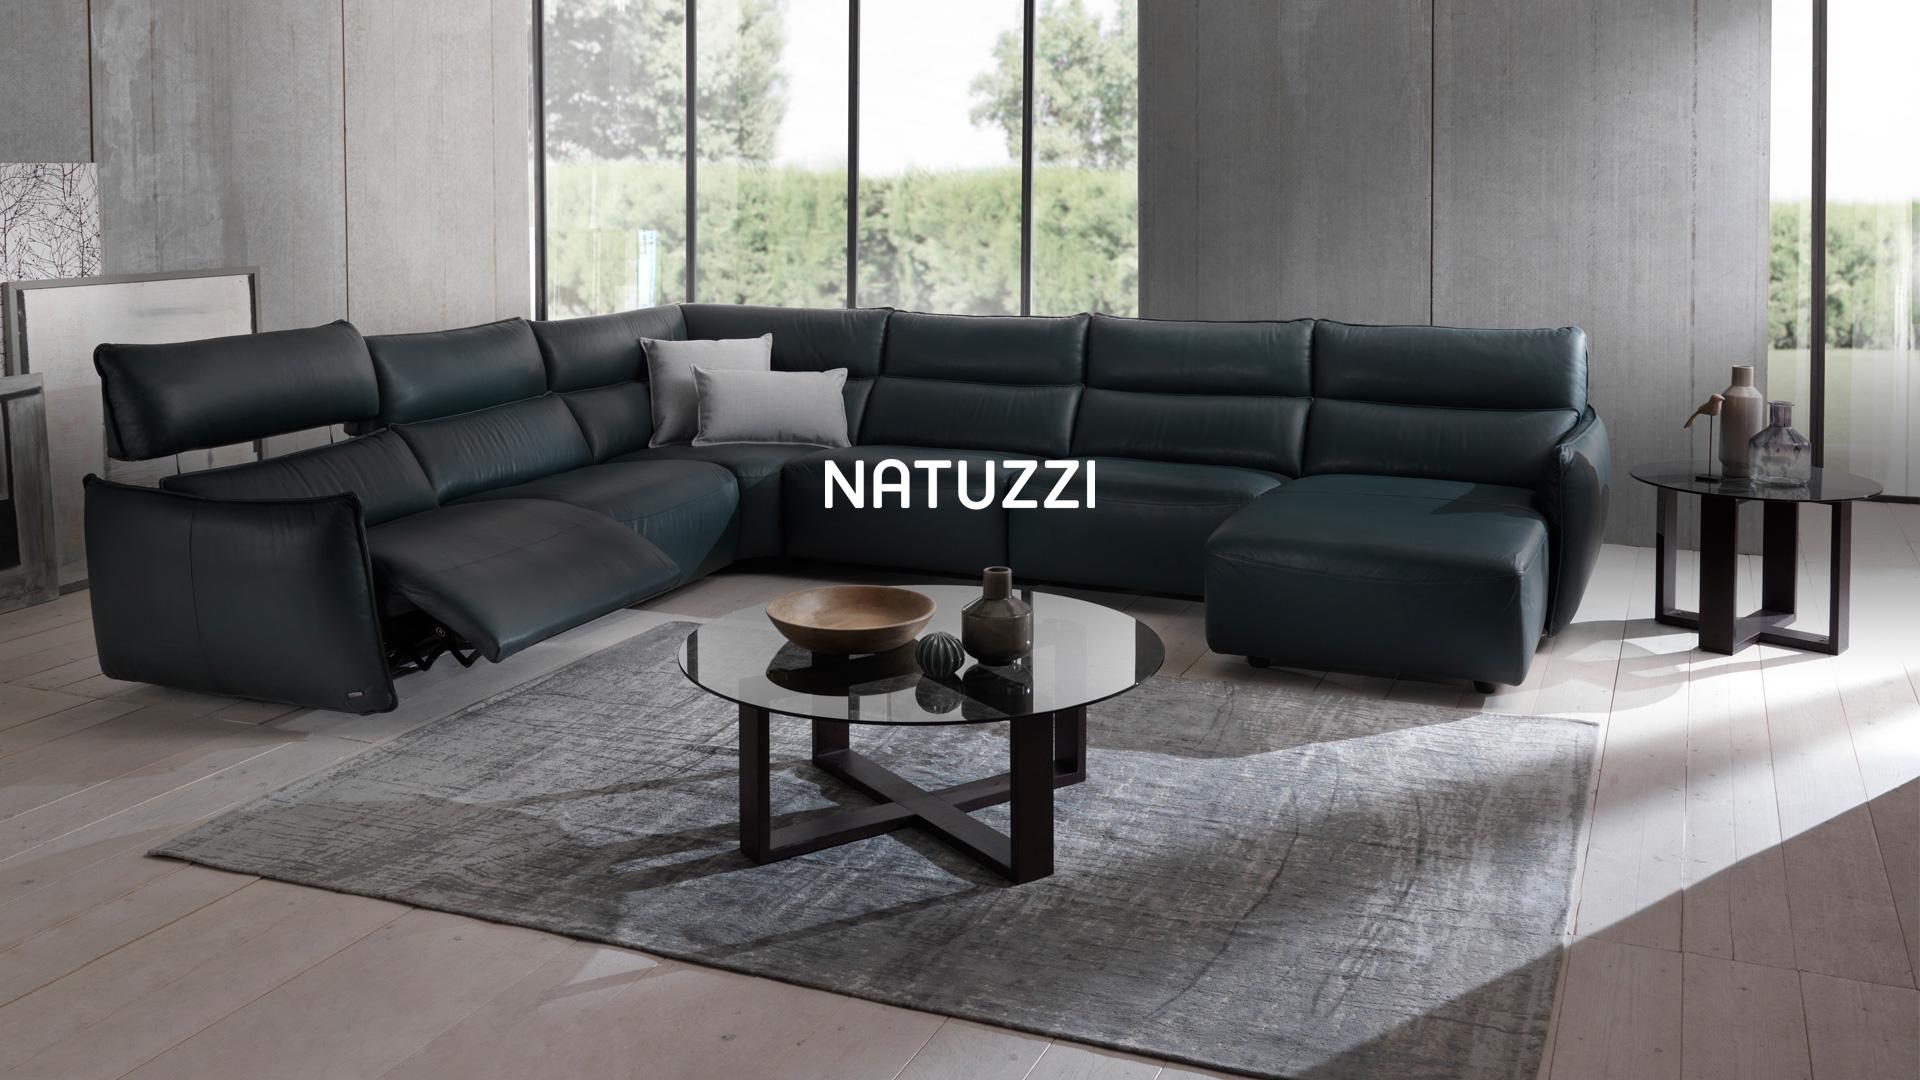 natuzzi-italia